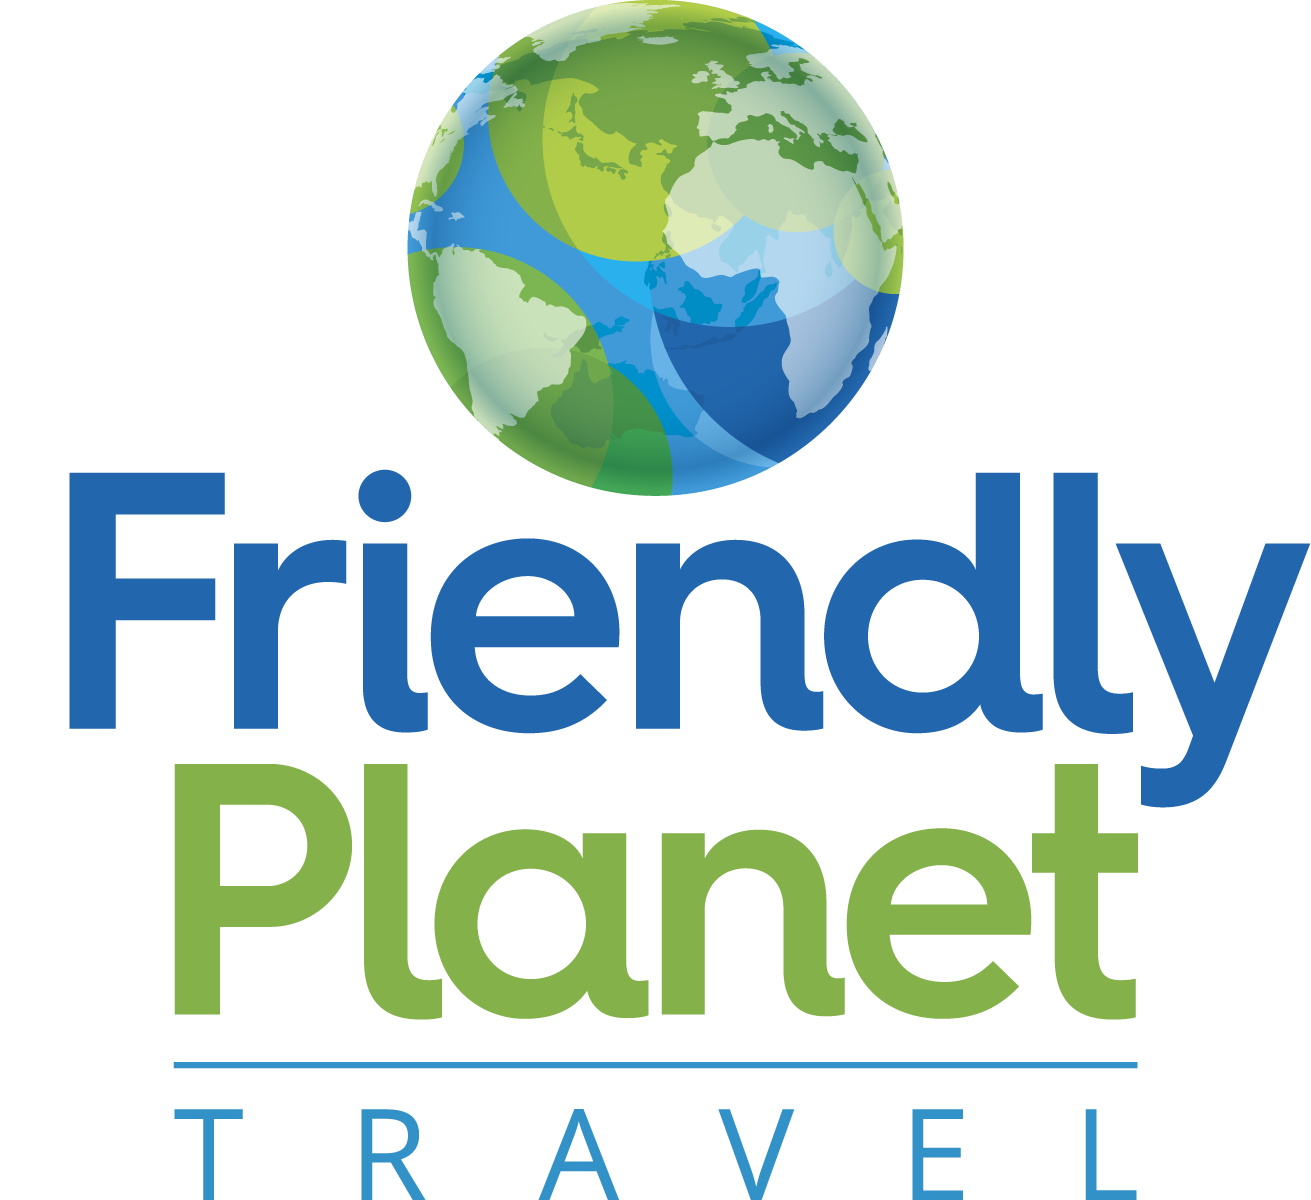 Tour operators internet travel company friendly planet for Internet plante